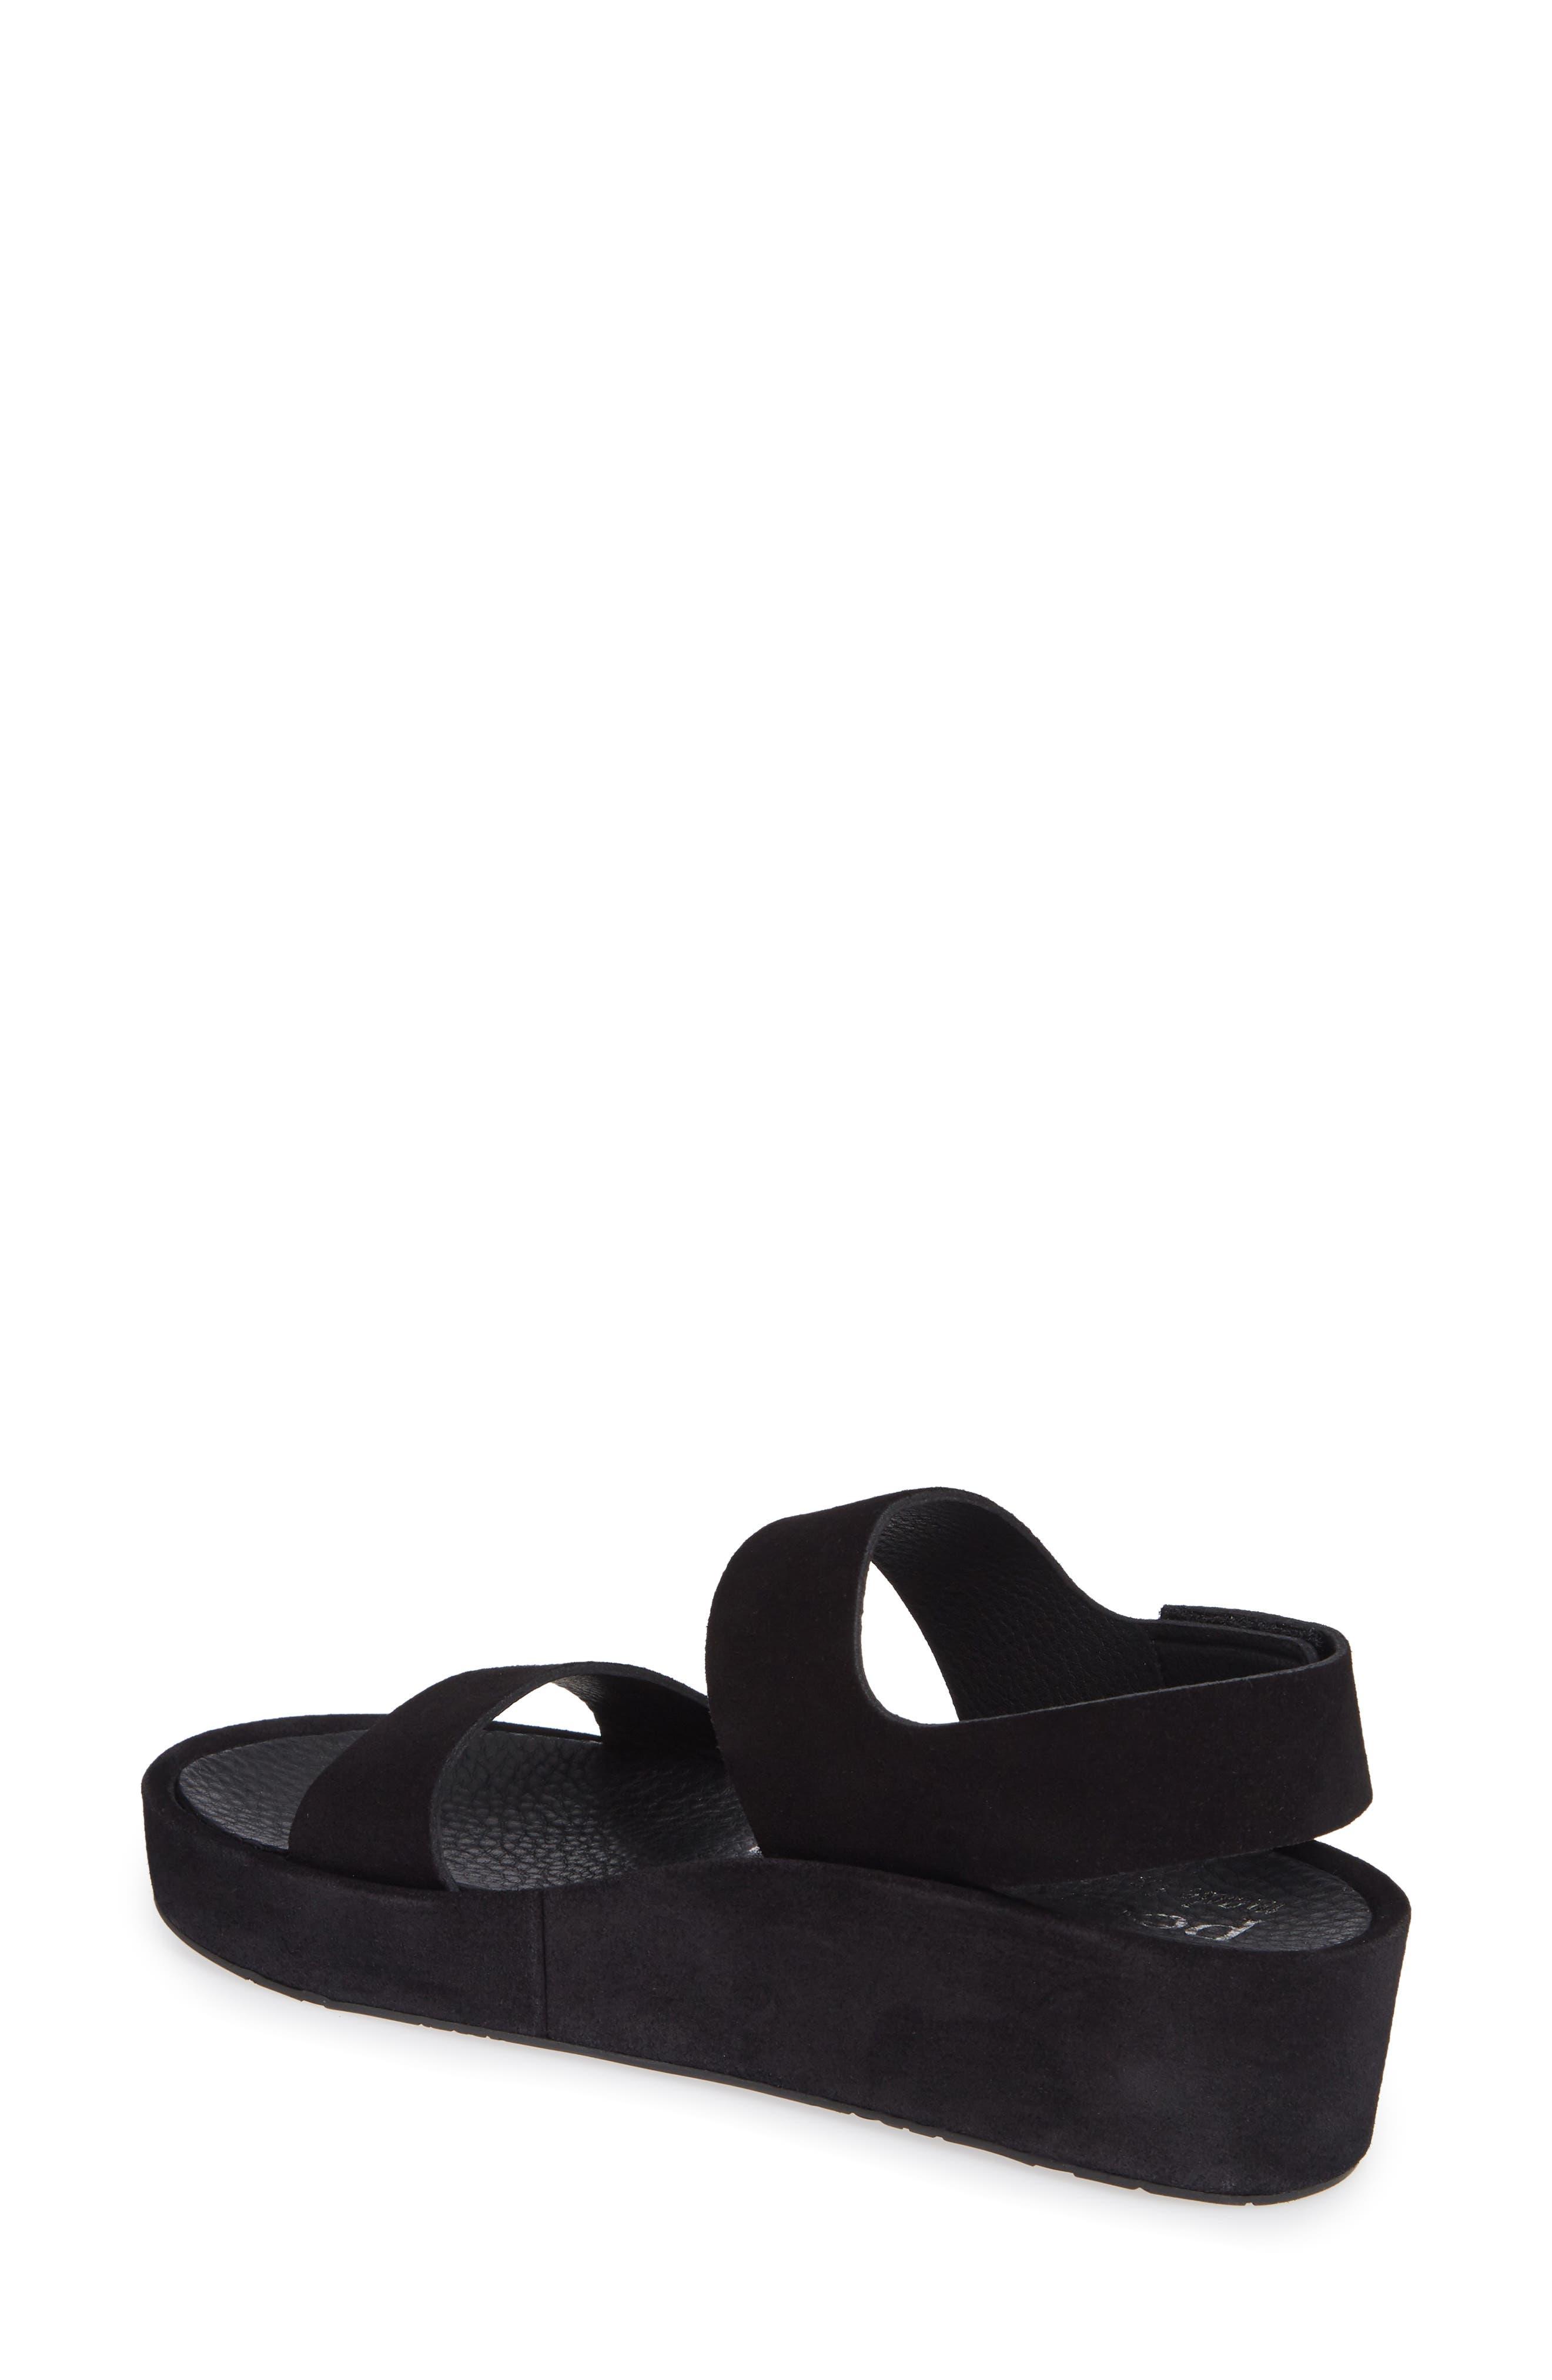 Lacey Footbed Sandal,                             Alternate thumbnail 2, color,                             BLACK CASTORO